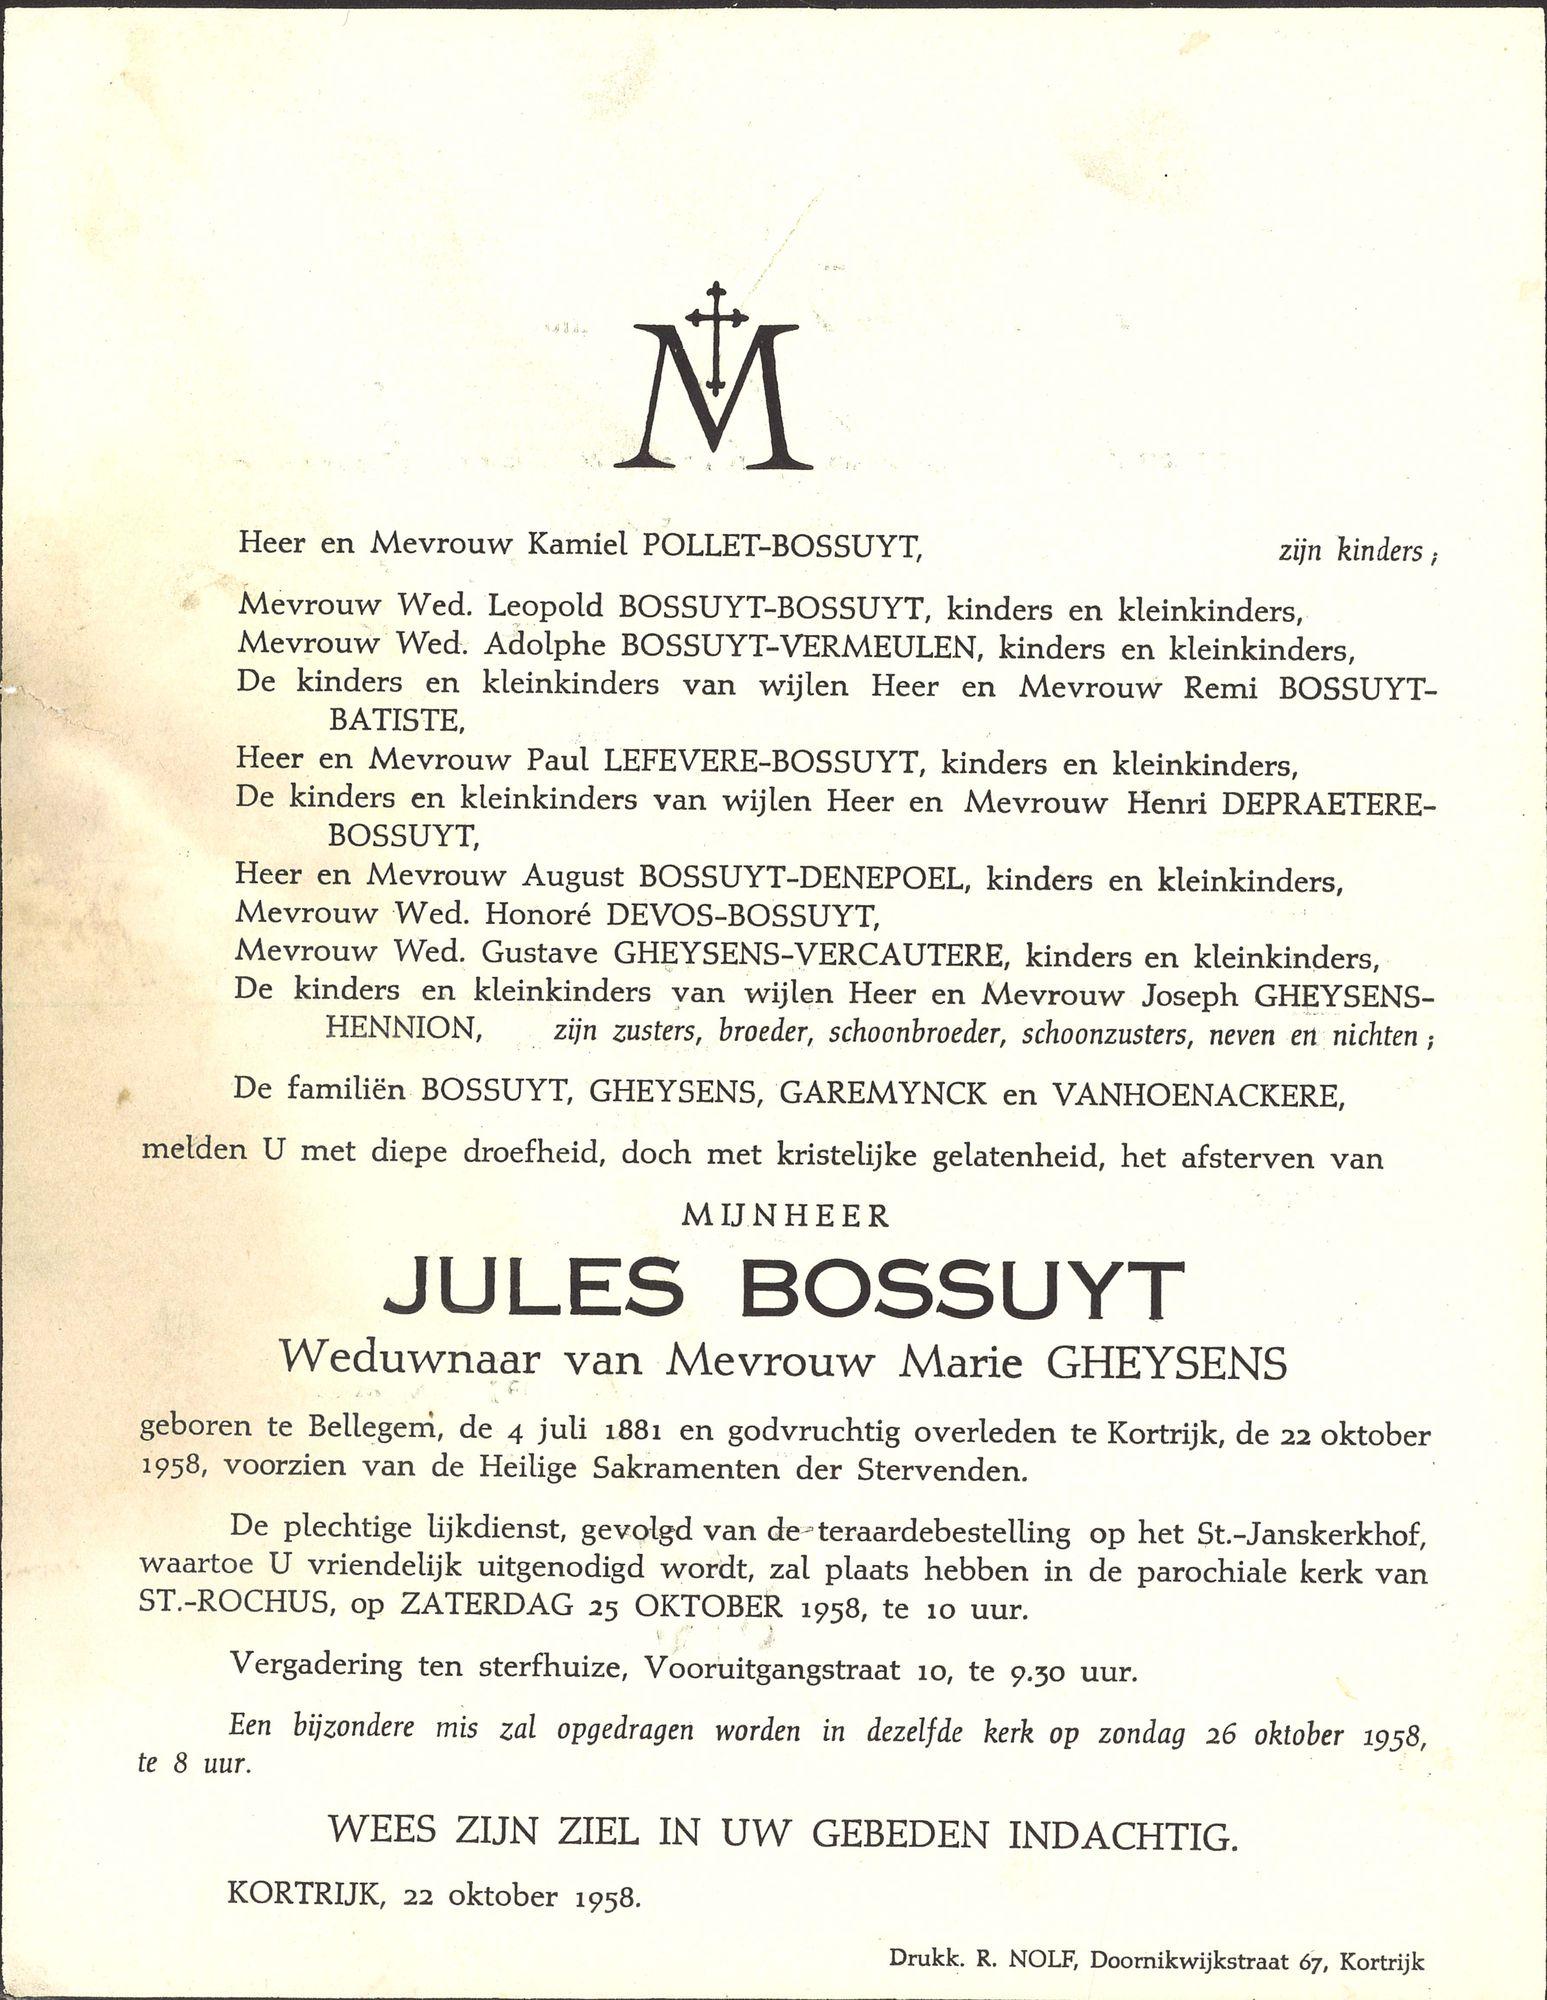 Jules Bossuyt